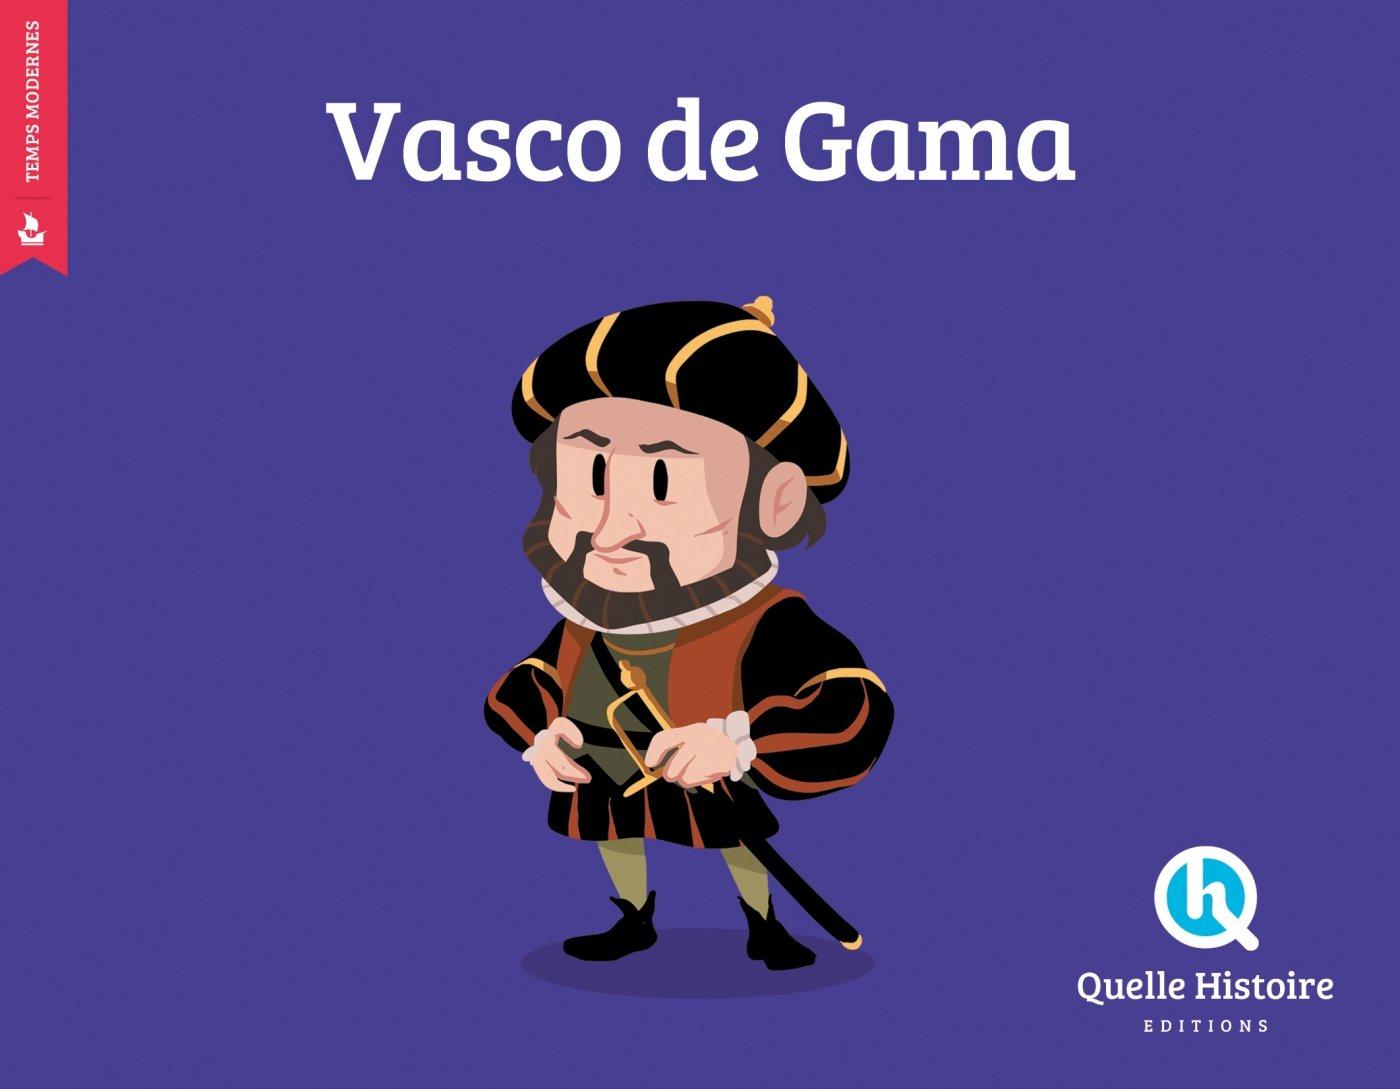 Vasco de Gama Album – 1 avril 2017 Clémentine V. Baron Bruno Wennagel Mathieu Ferret Quelle Histoire Editions